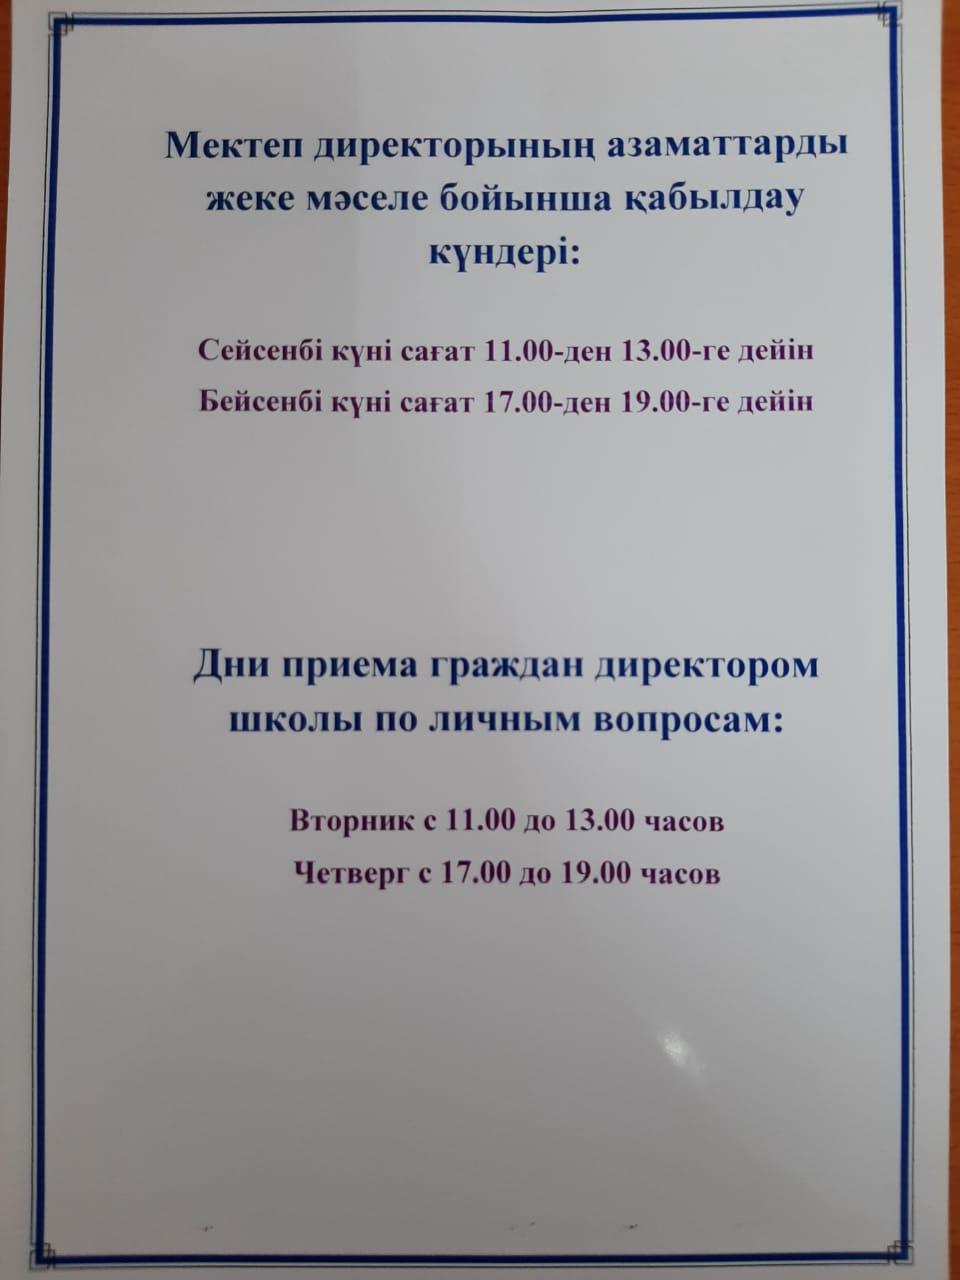 http://23.astana-bilim.kz/files/sites/1383501240817982/files/IMG-20200227-WA0026.jpg